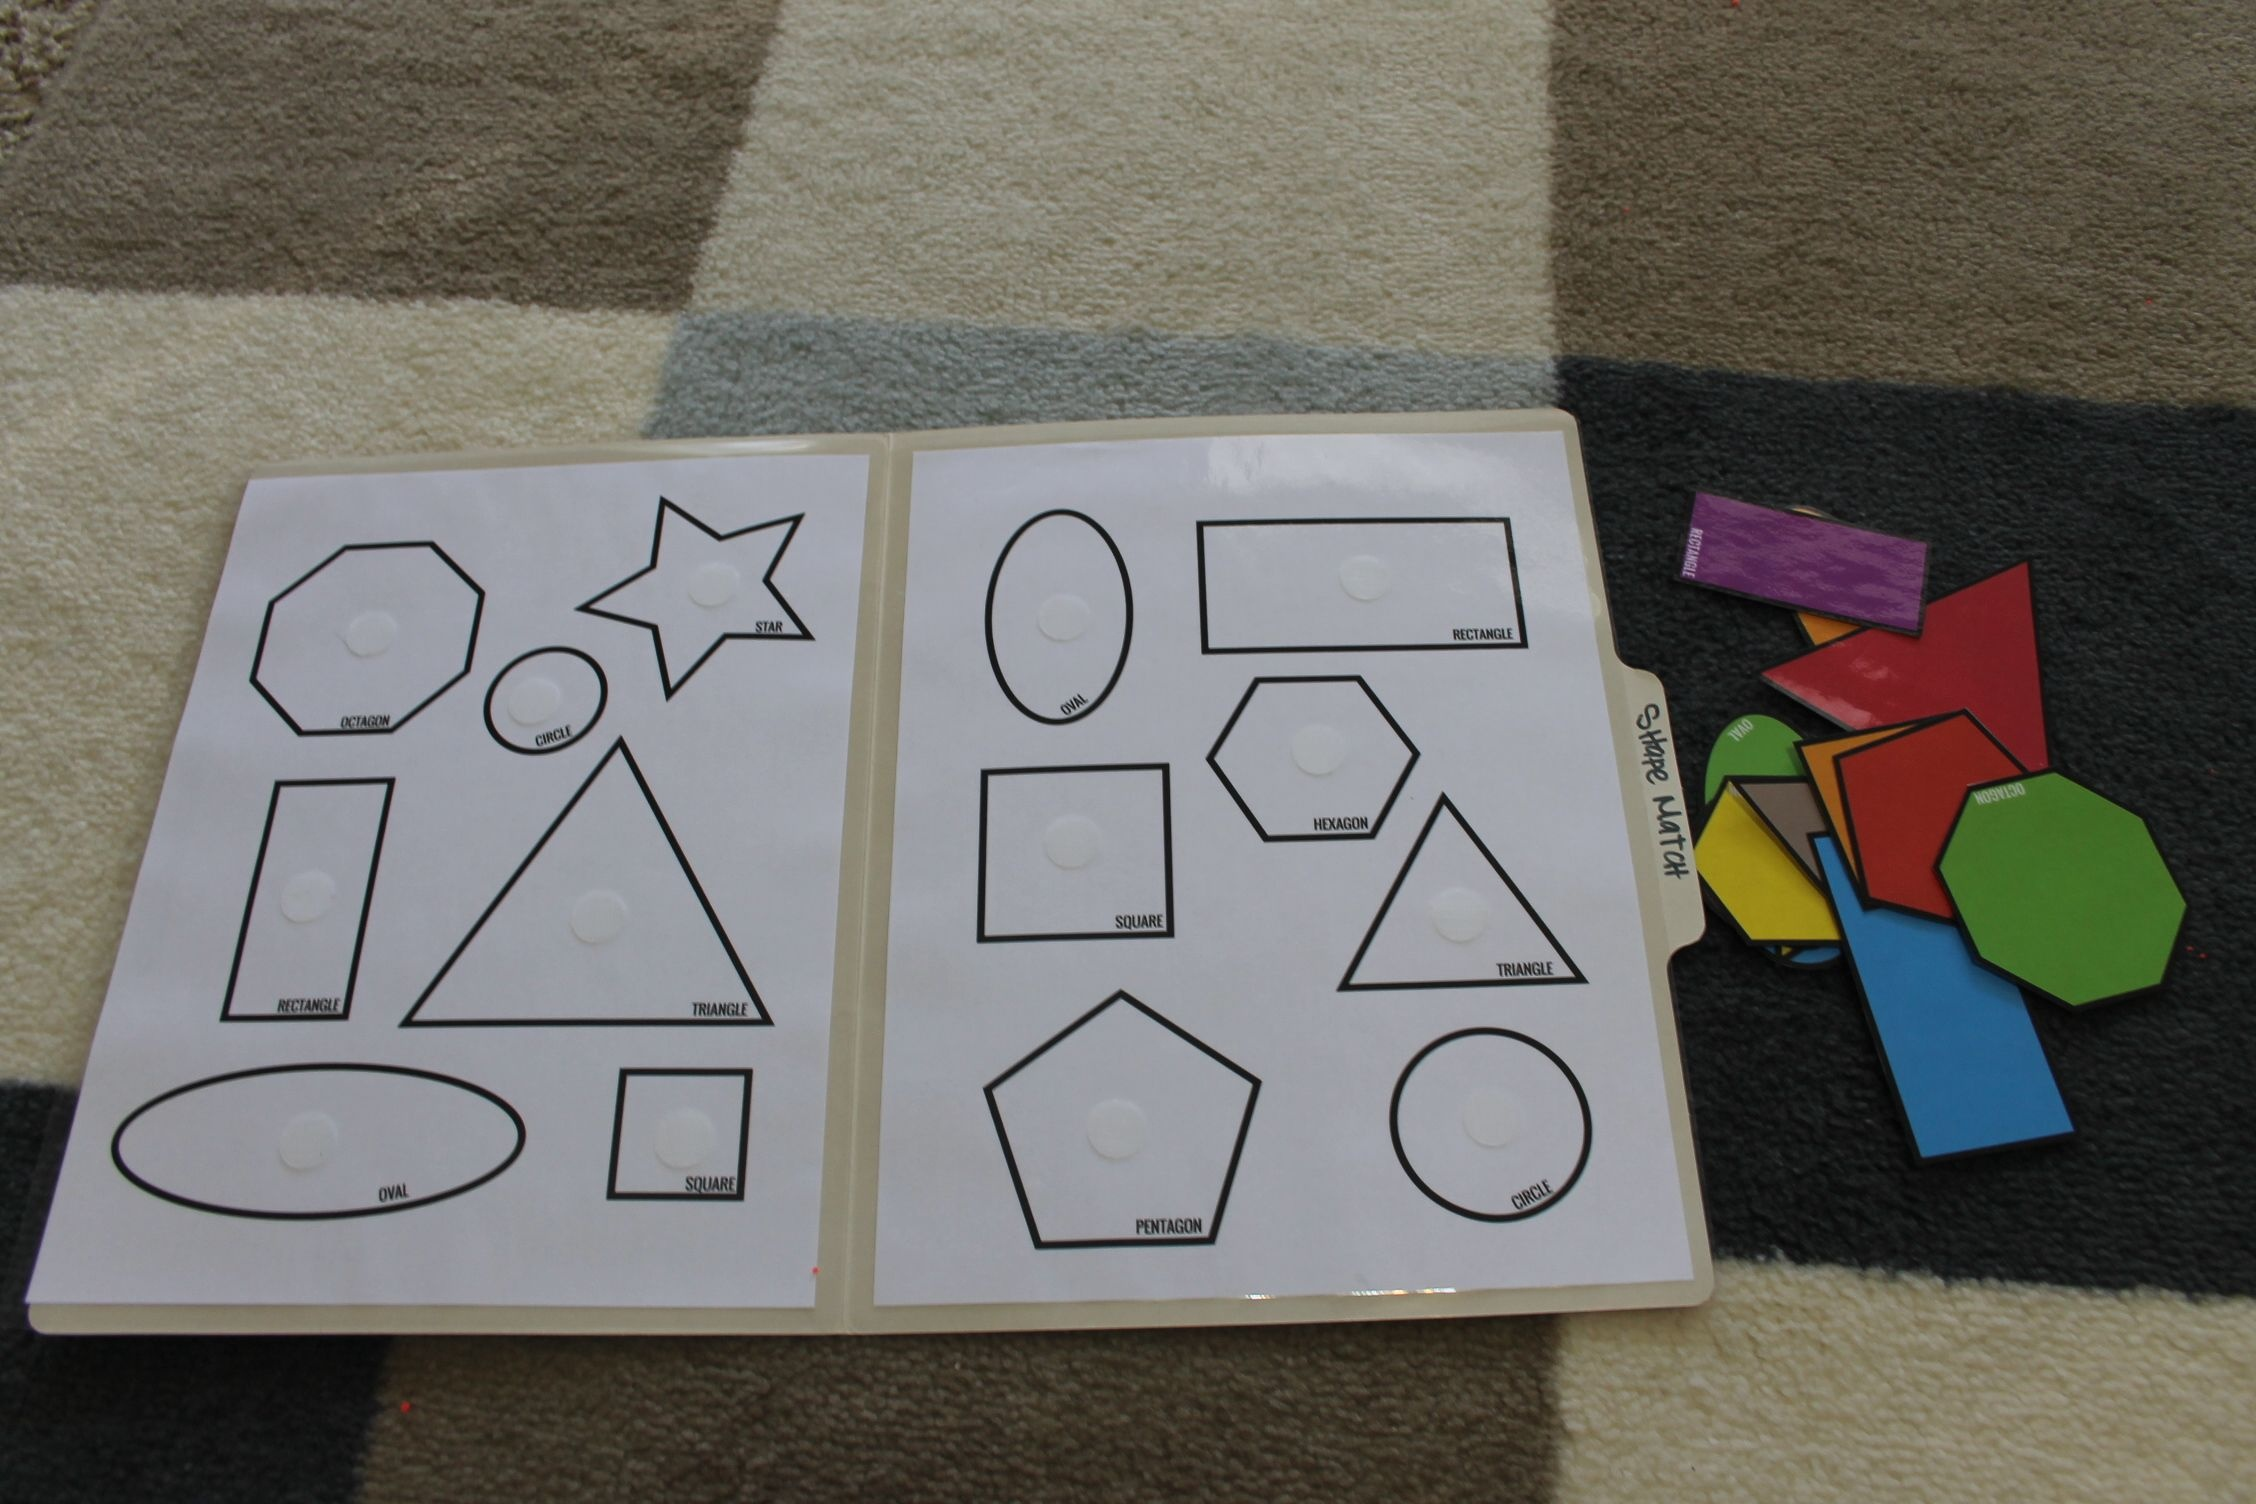 Shape-Match-Toddler-Pre-K-File-Folder-Game-Open   Vpk   Folder Games - File Folder Games For Toddlers Free Printable